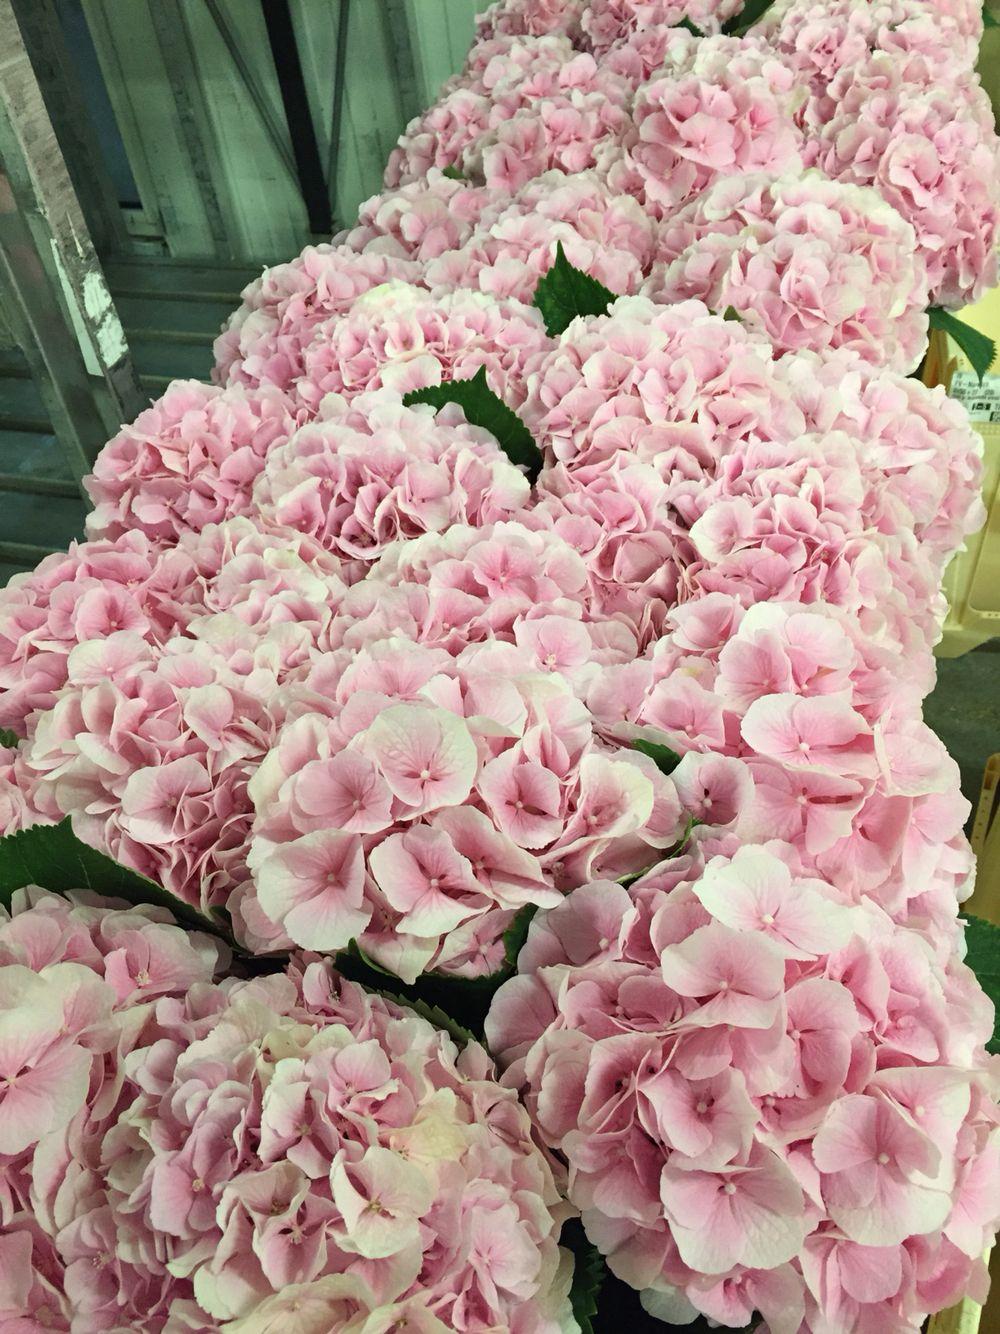 Hydrangea Verena Pale Pink At Flowervision Brollop